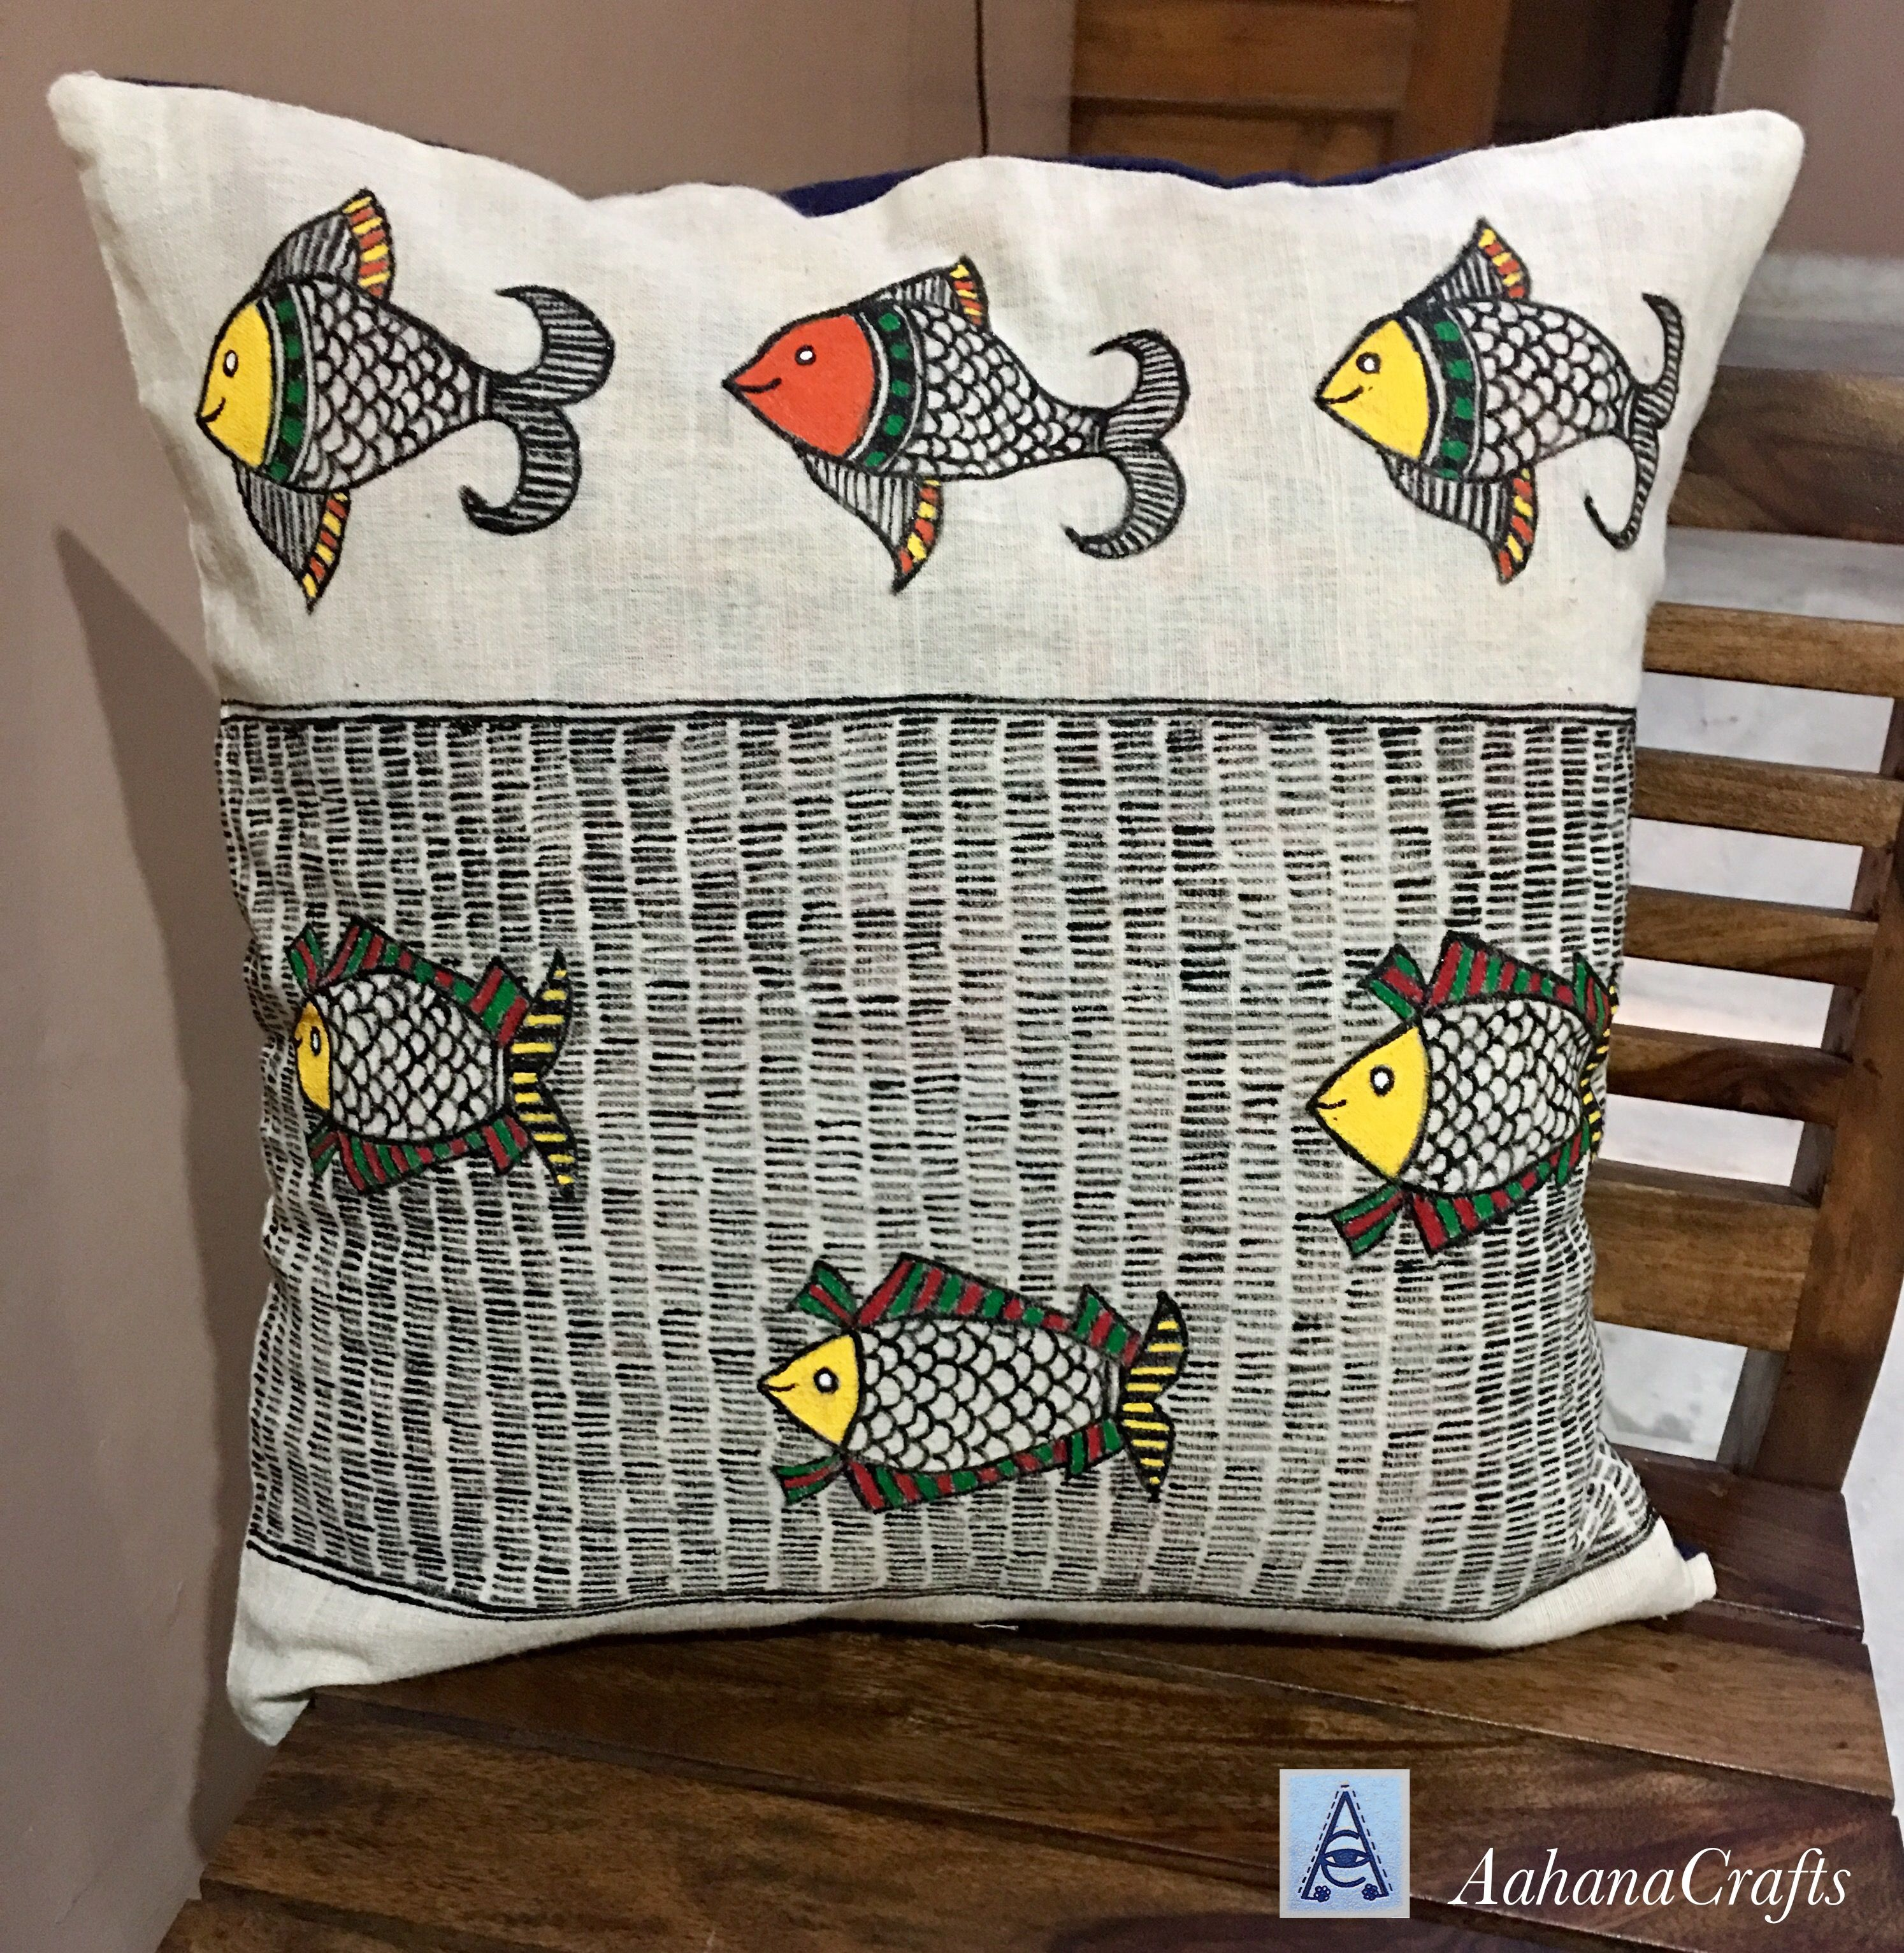 Madhubani Painting On Khadi Cushion Cover By Aahanacrafts Visit Us